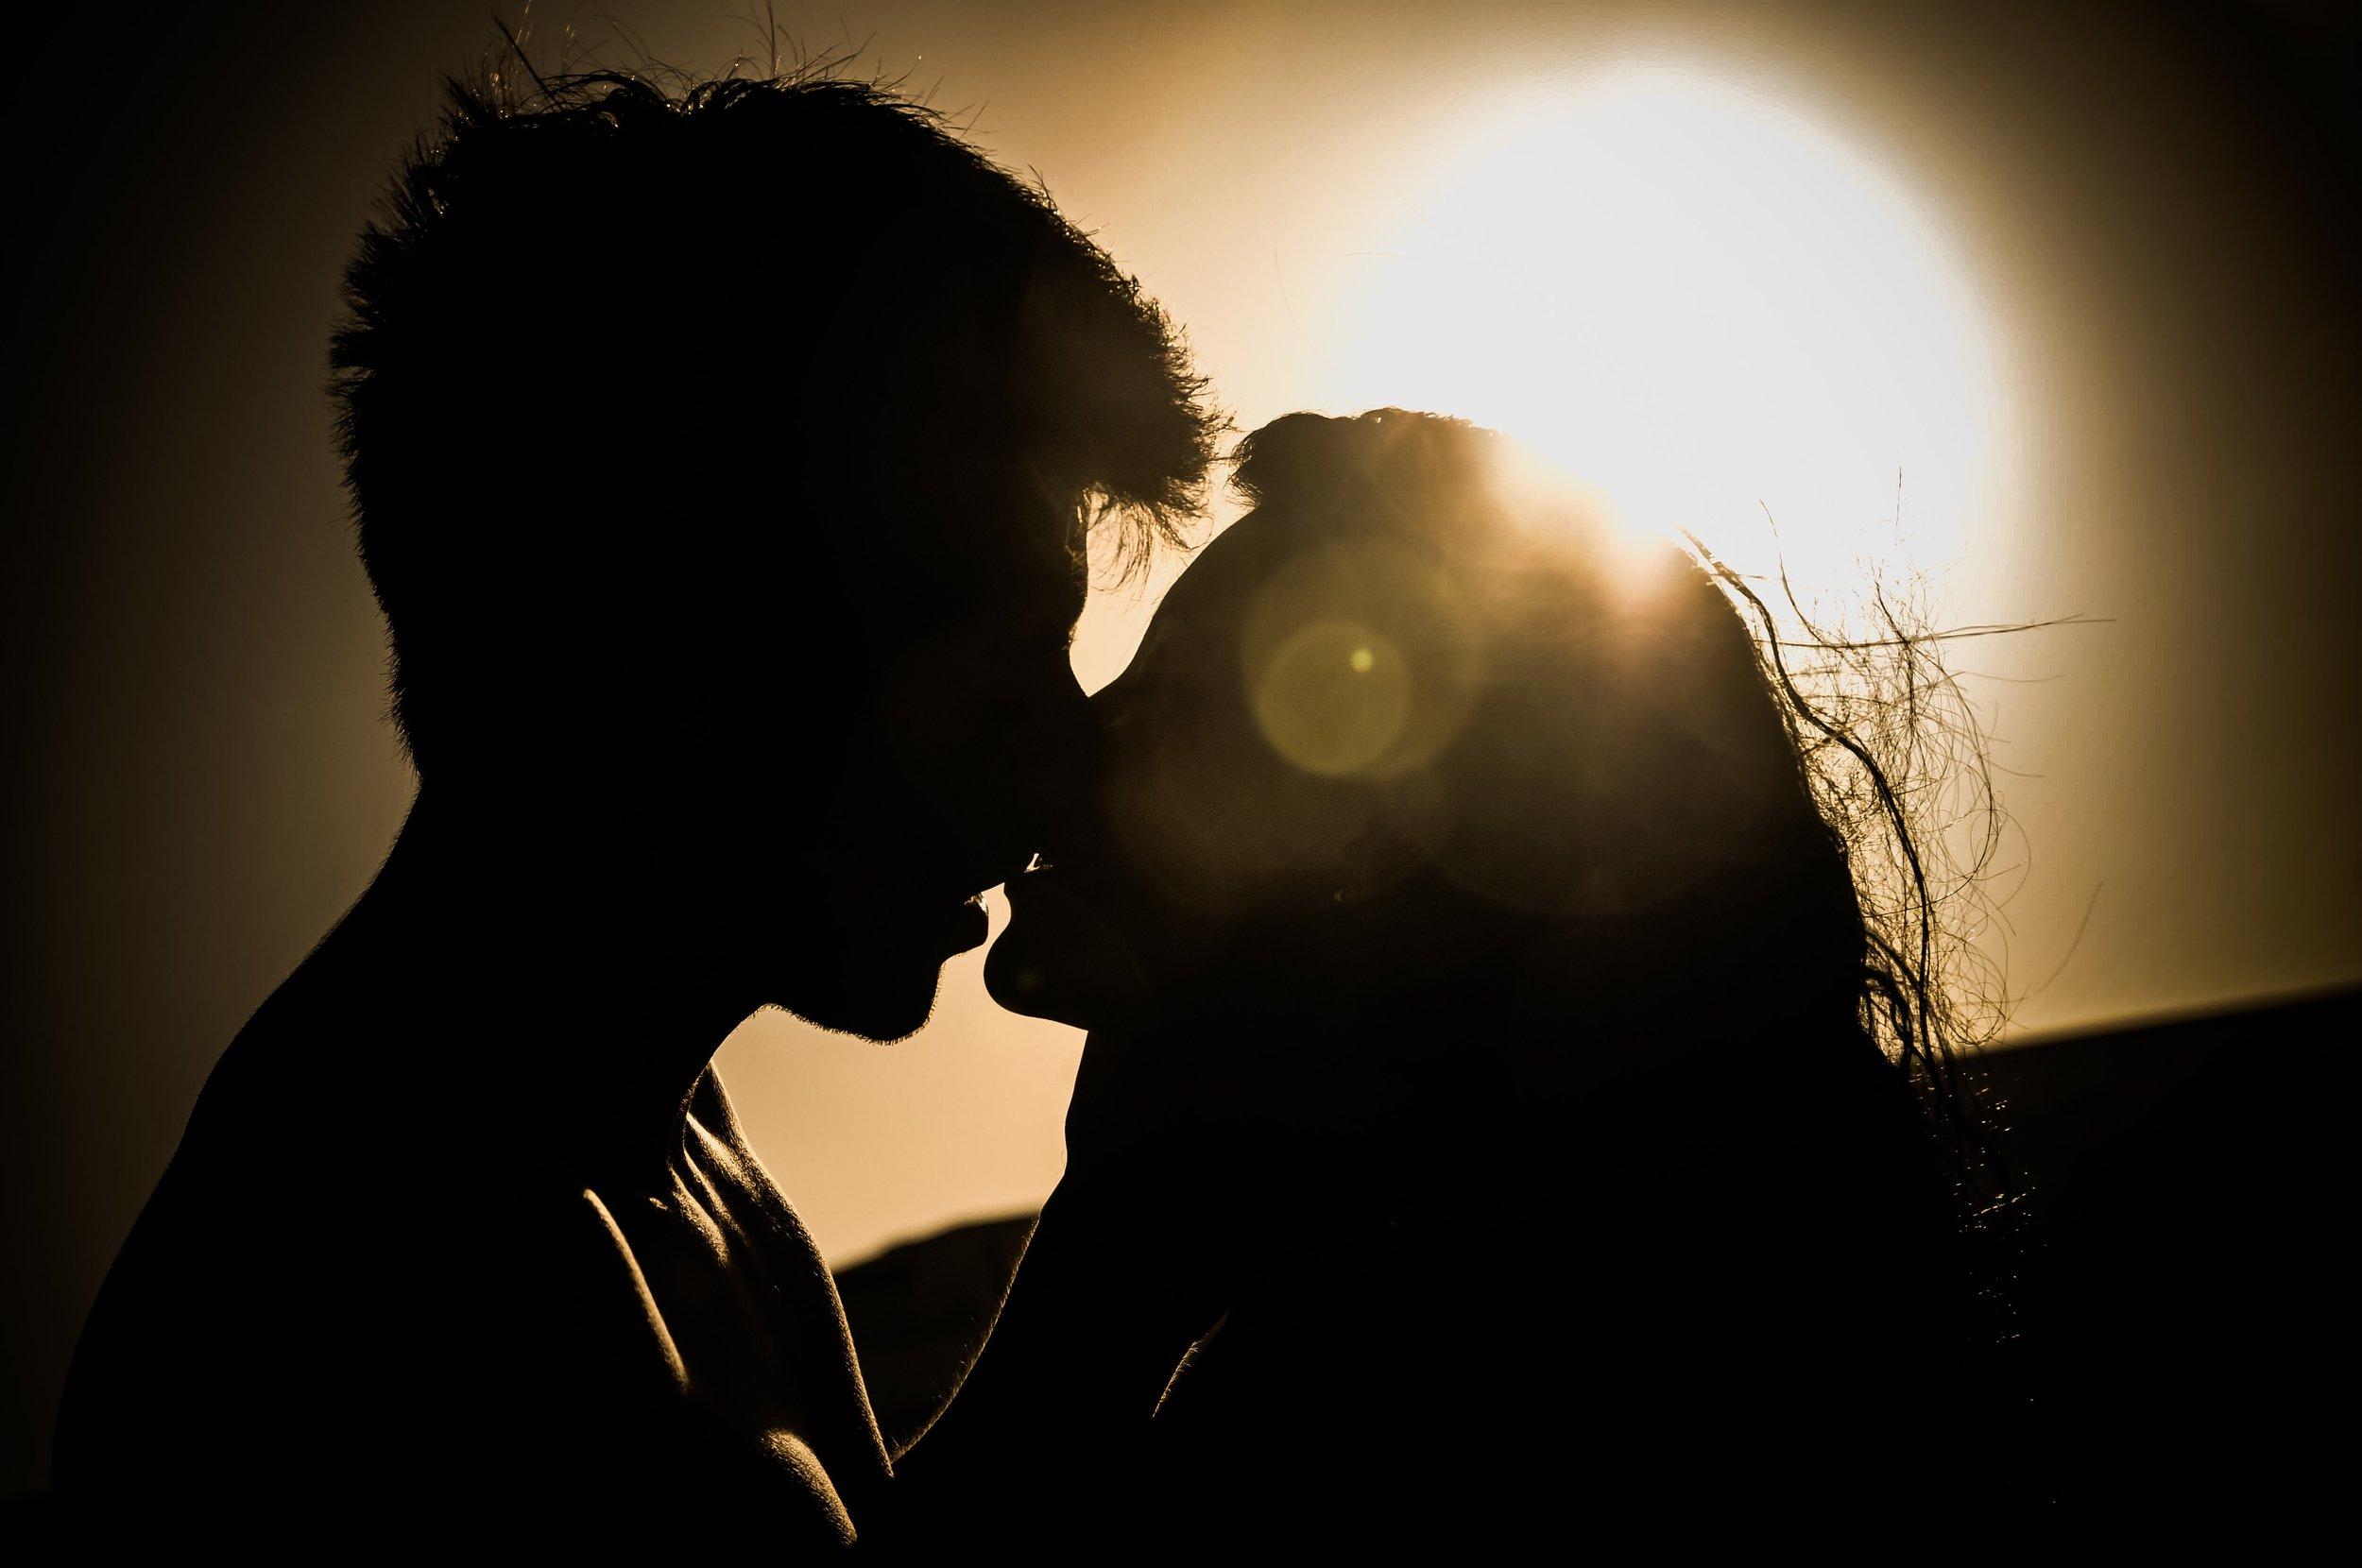 affection-attachment-couple-41068.jpg